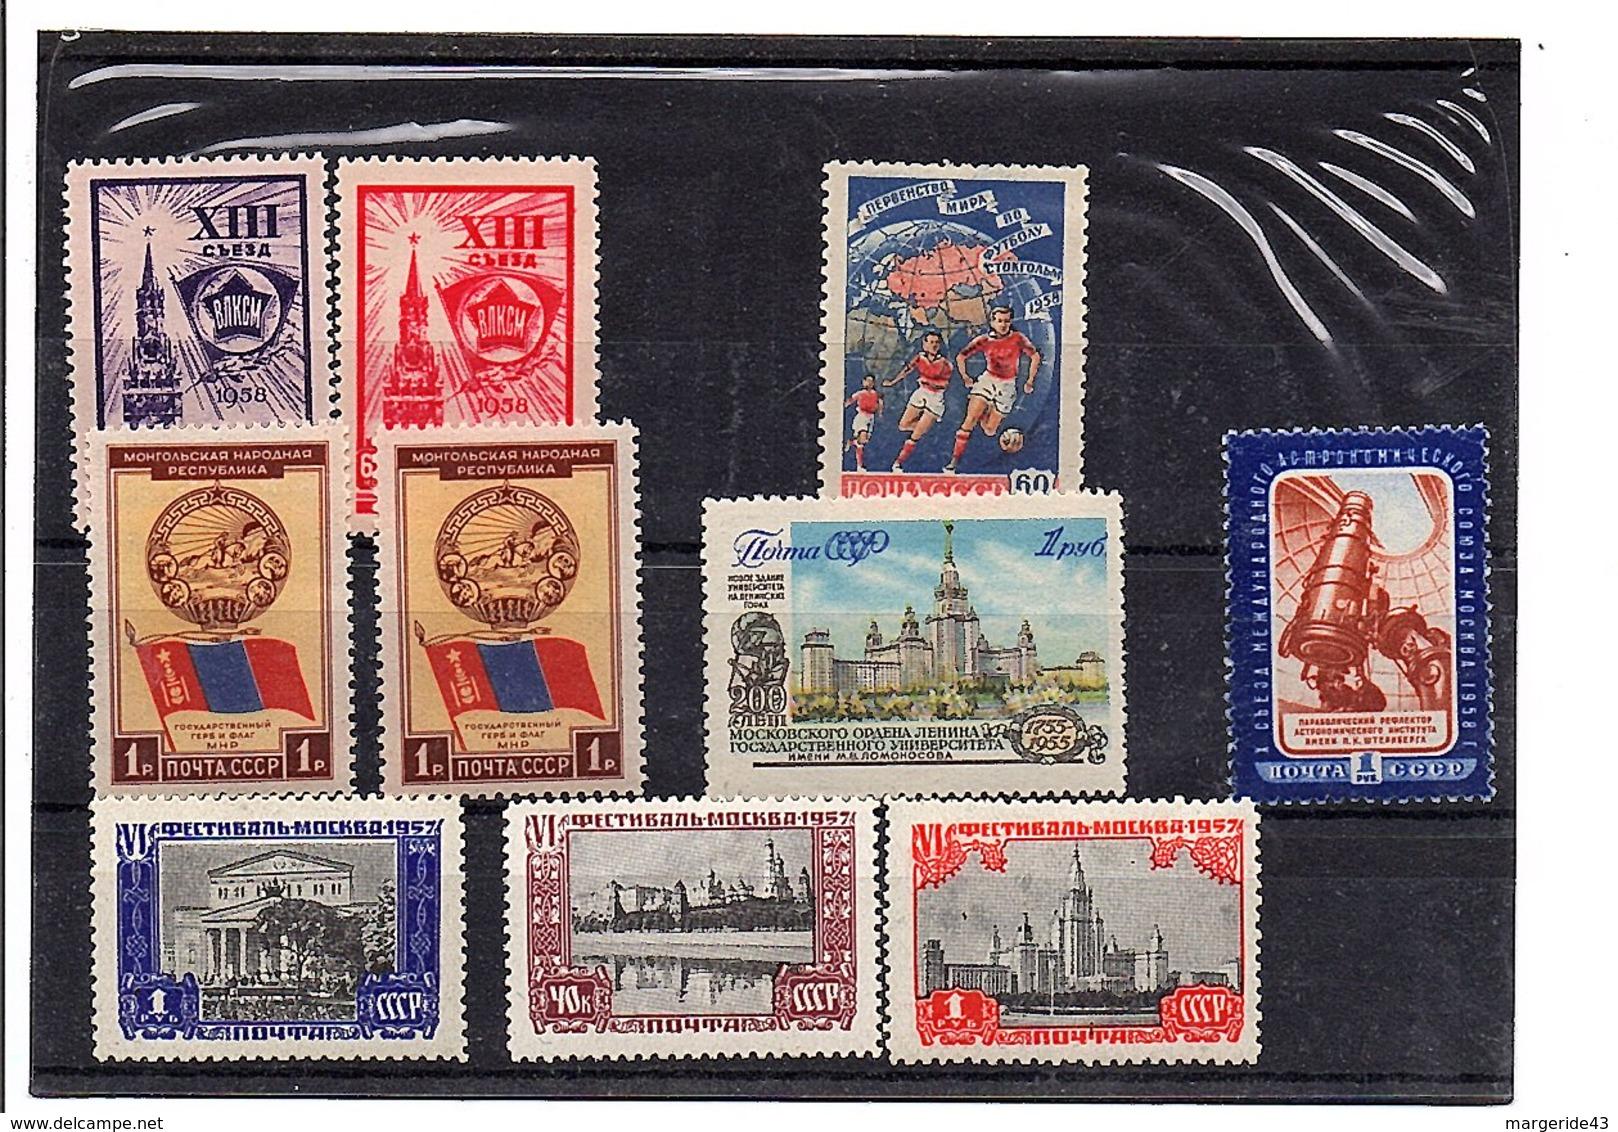 URSS LOT DE TIMBRES NEUFS - Lots & Kiloware (mixtures) - Max. 999 Stamps